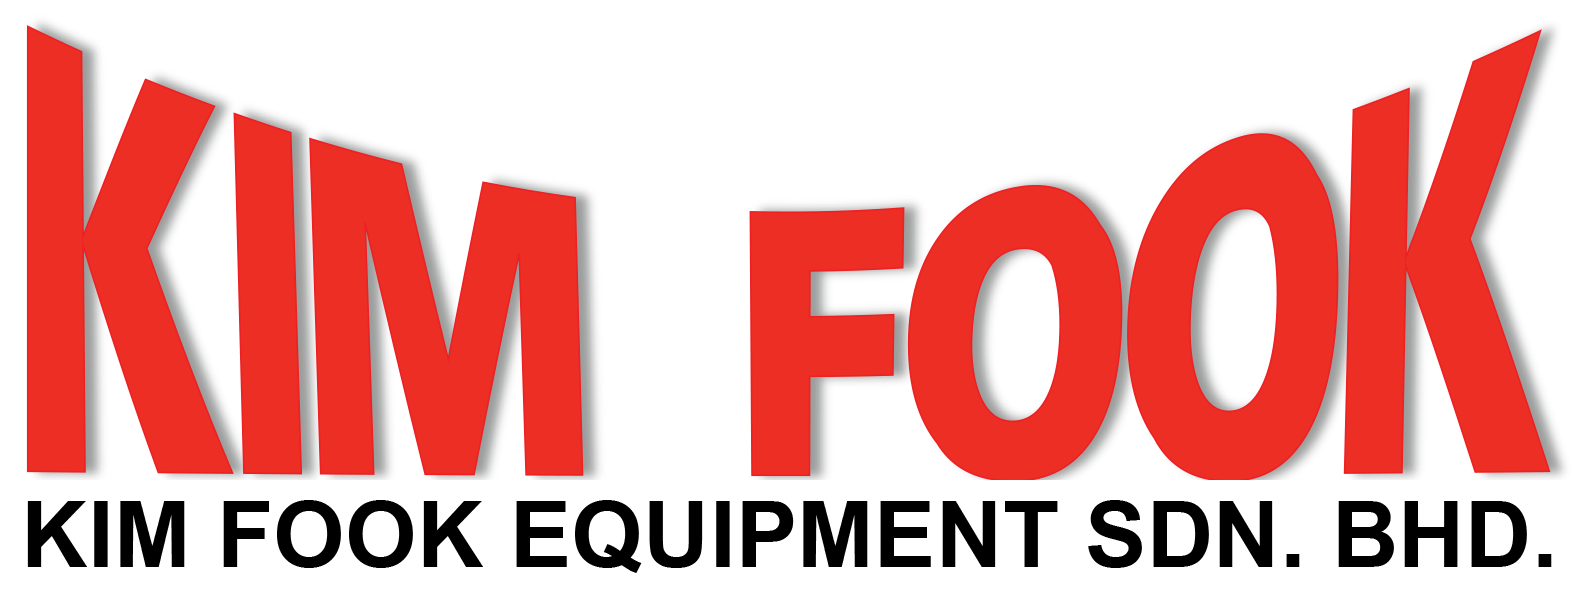 Fuji Xerox Johor Bahru Copier Services